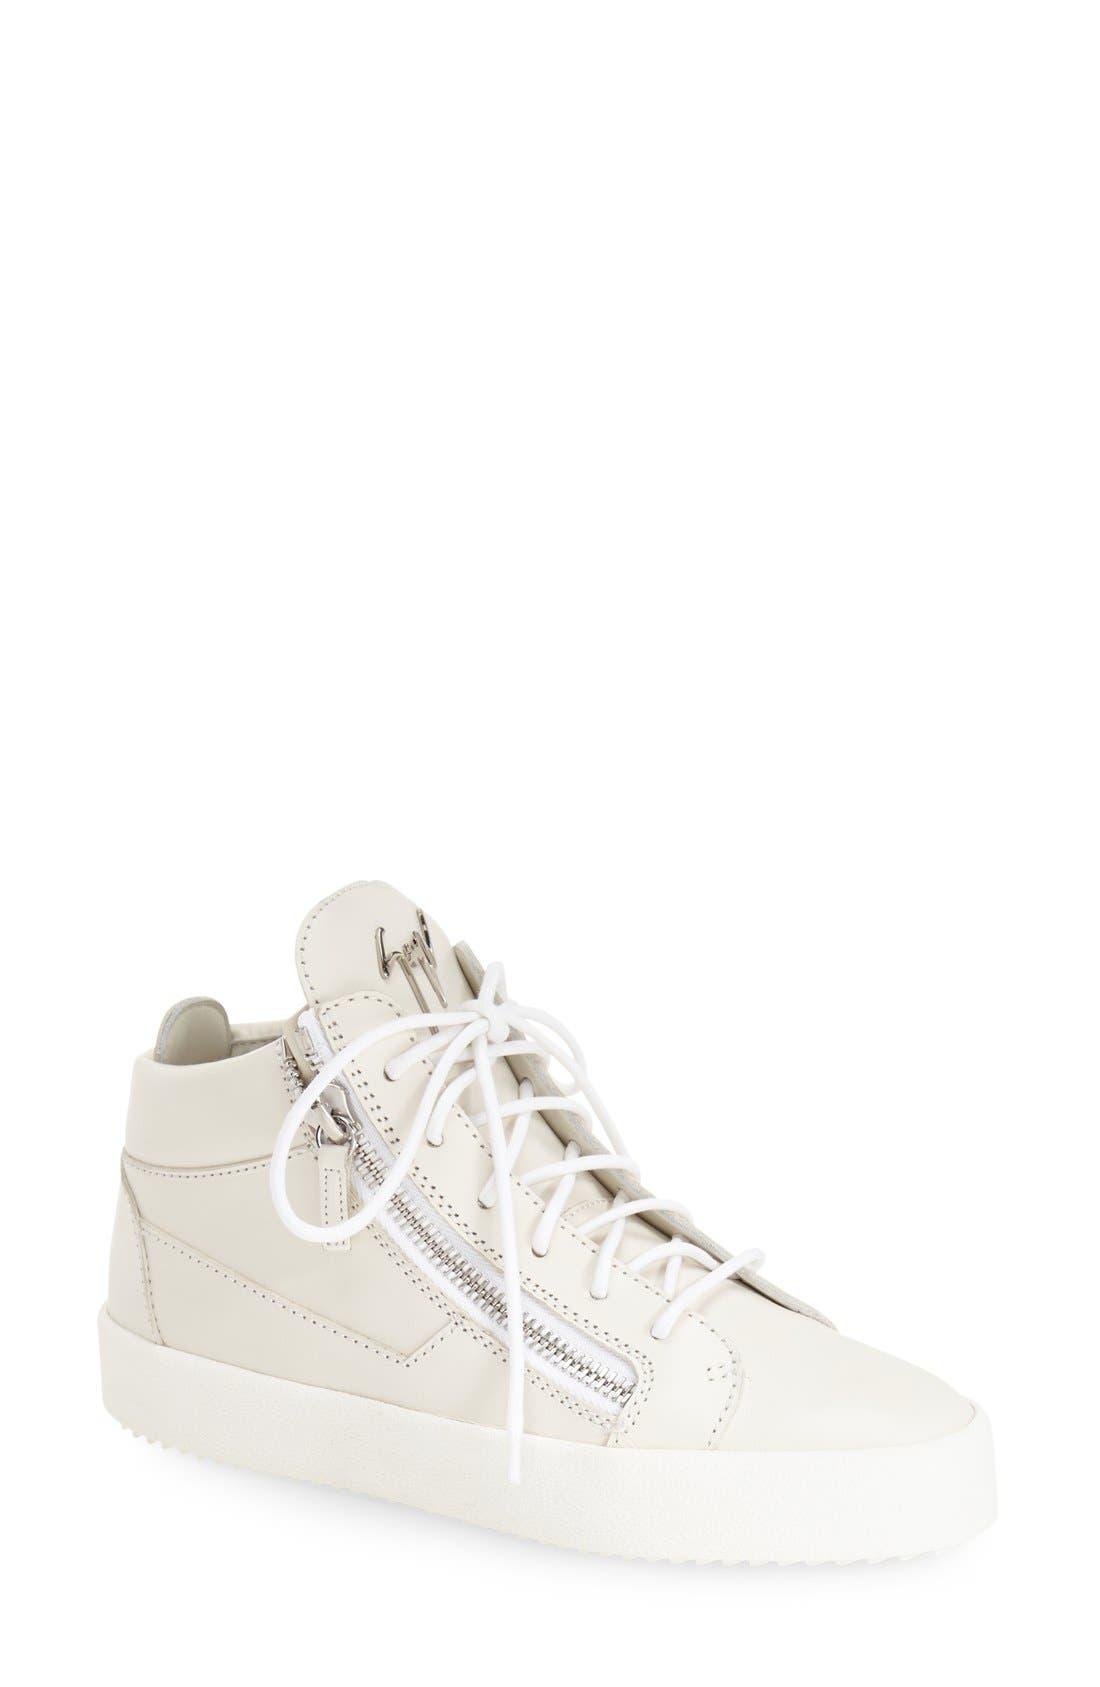 High Top Sneaker,                         Main,                         color, 020